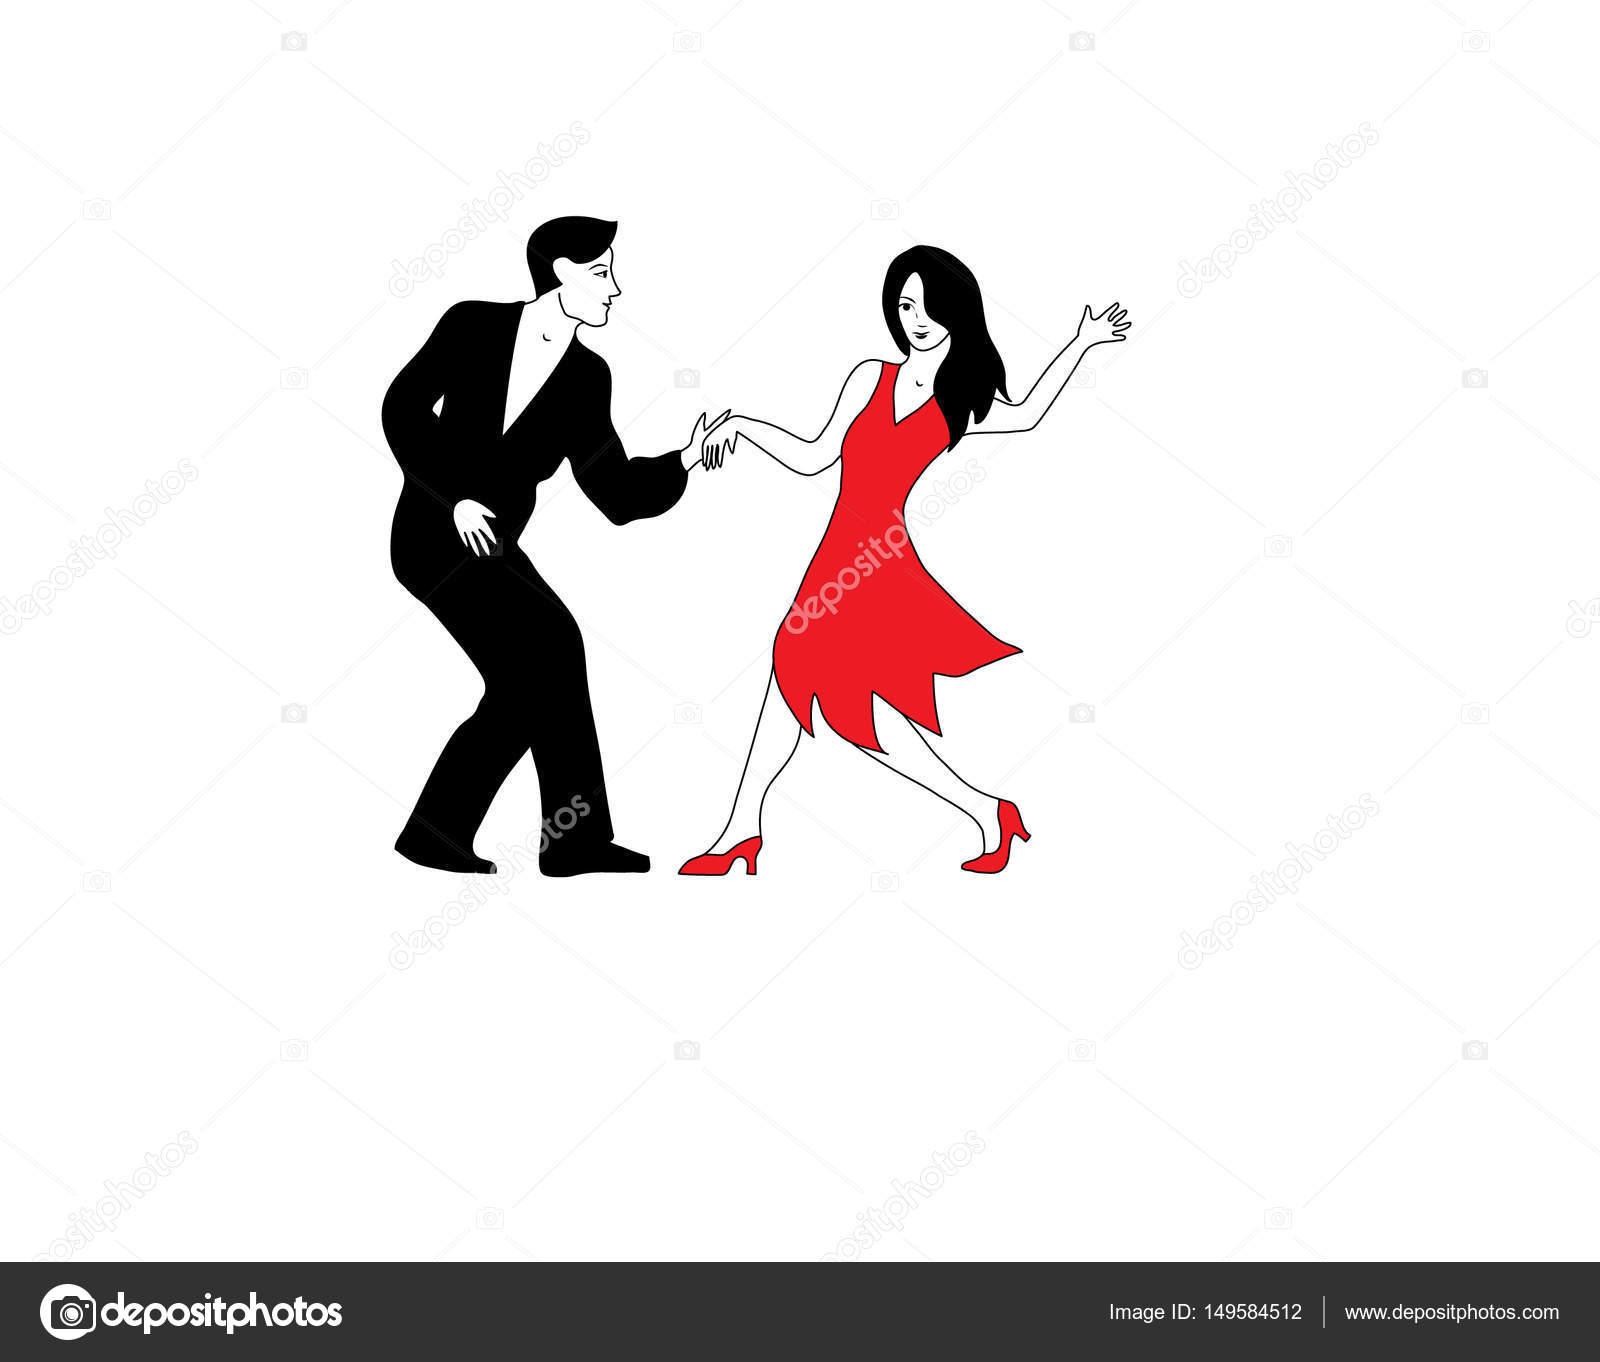 Ehe nicht aus ep 6 kiss Szene